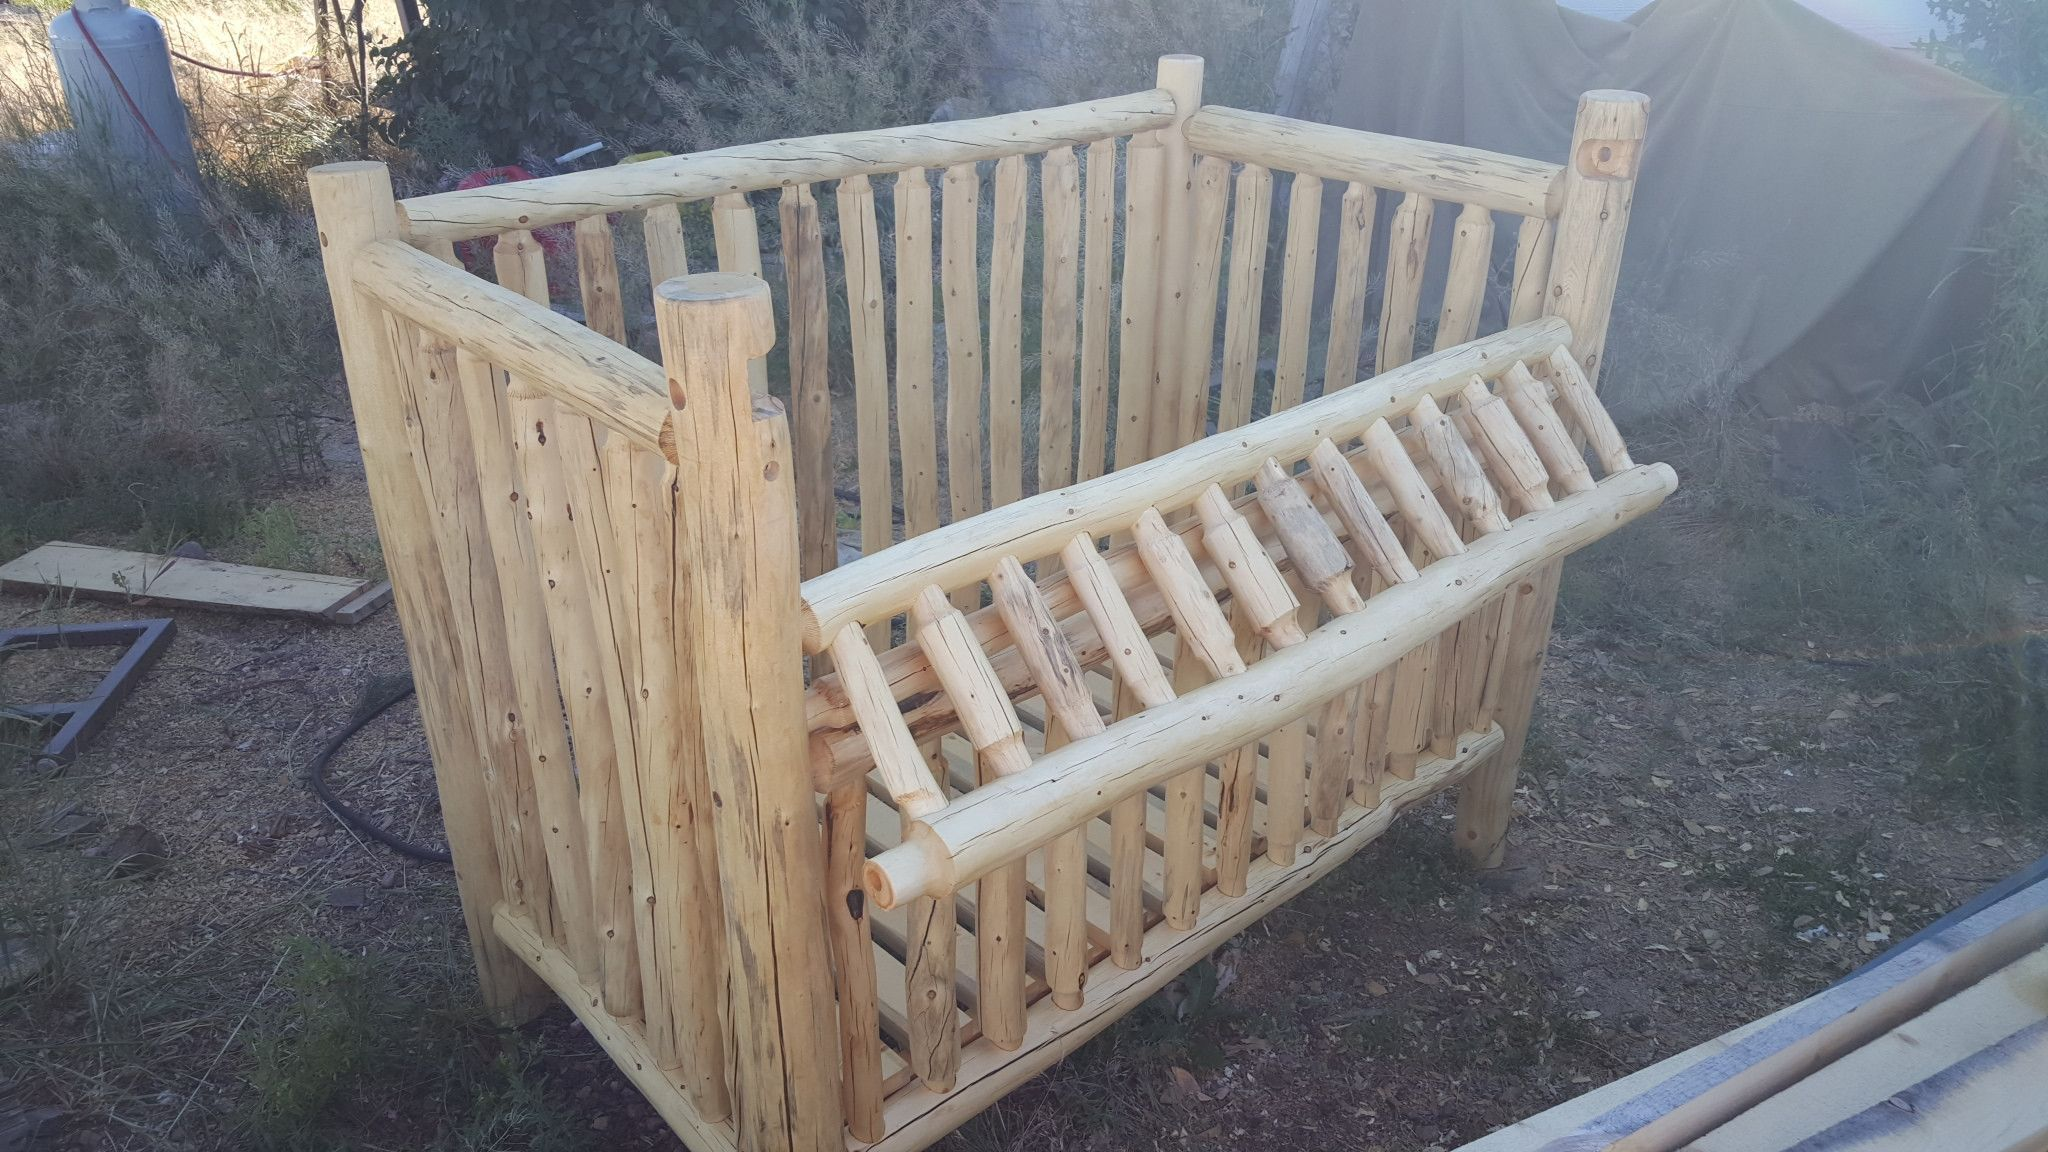 The Rustic Handmade log nursery Convertable